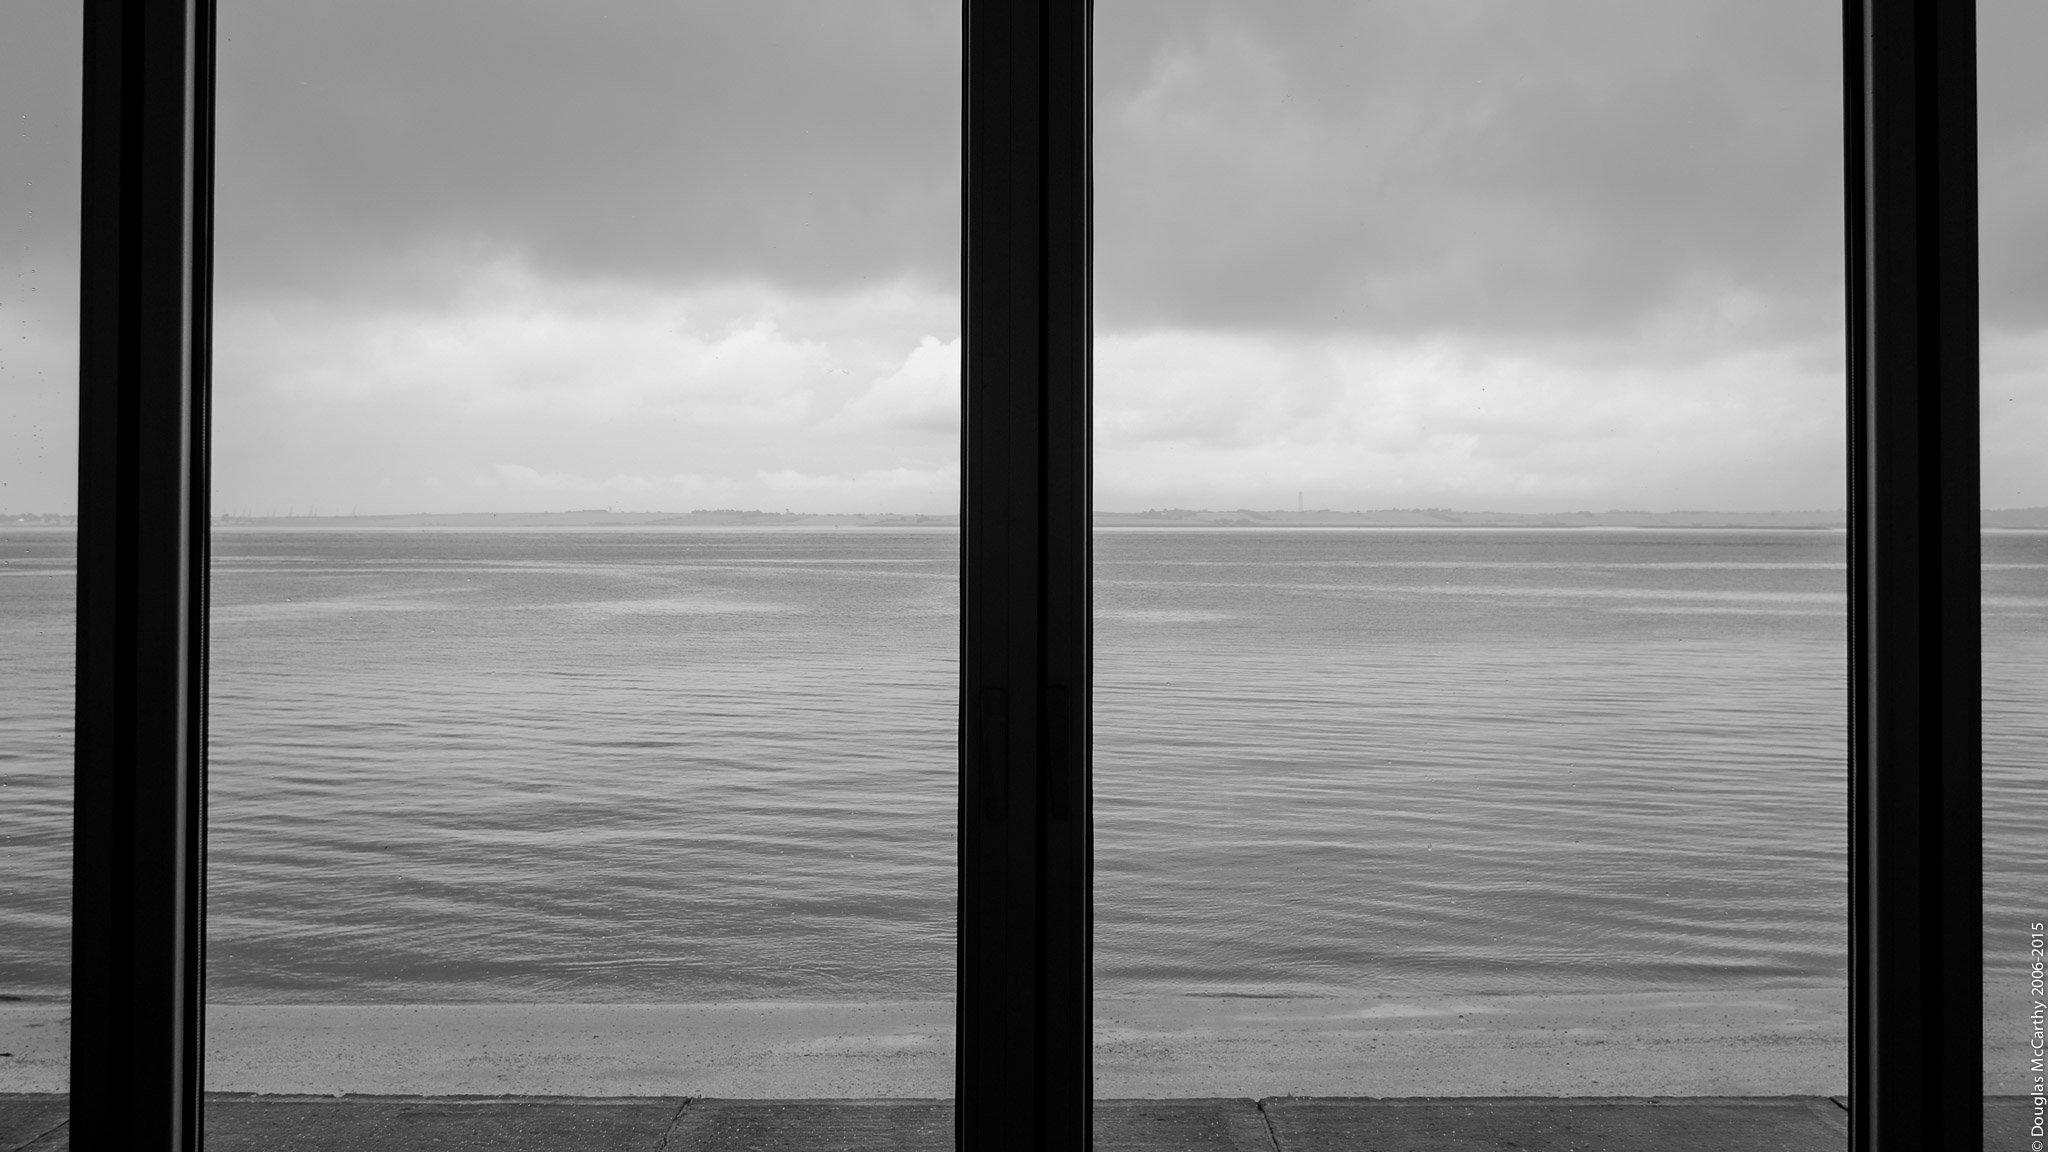 Labworth Prospect, Canvey Island